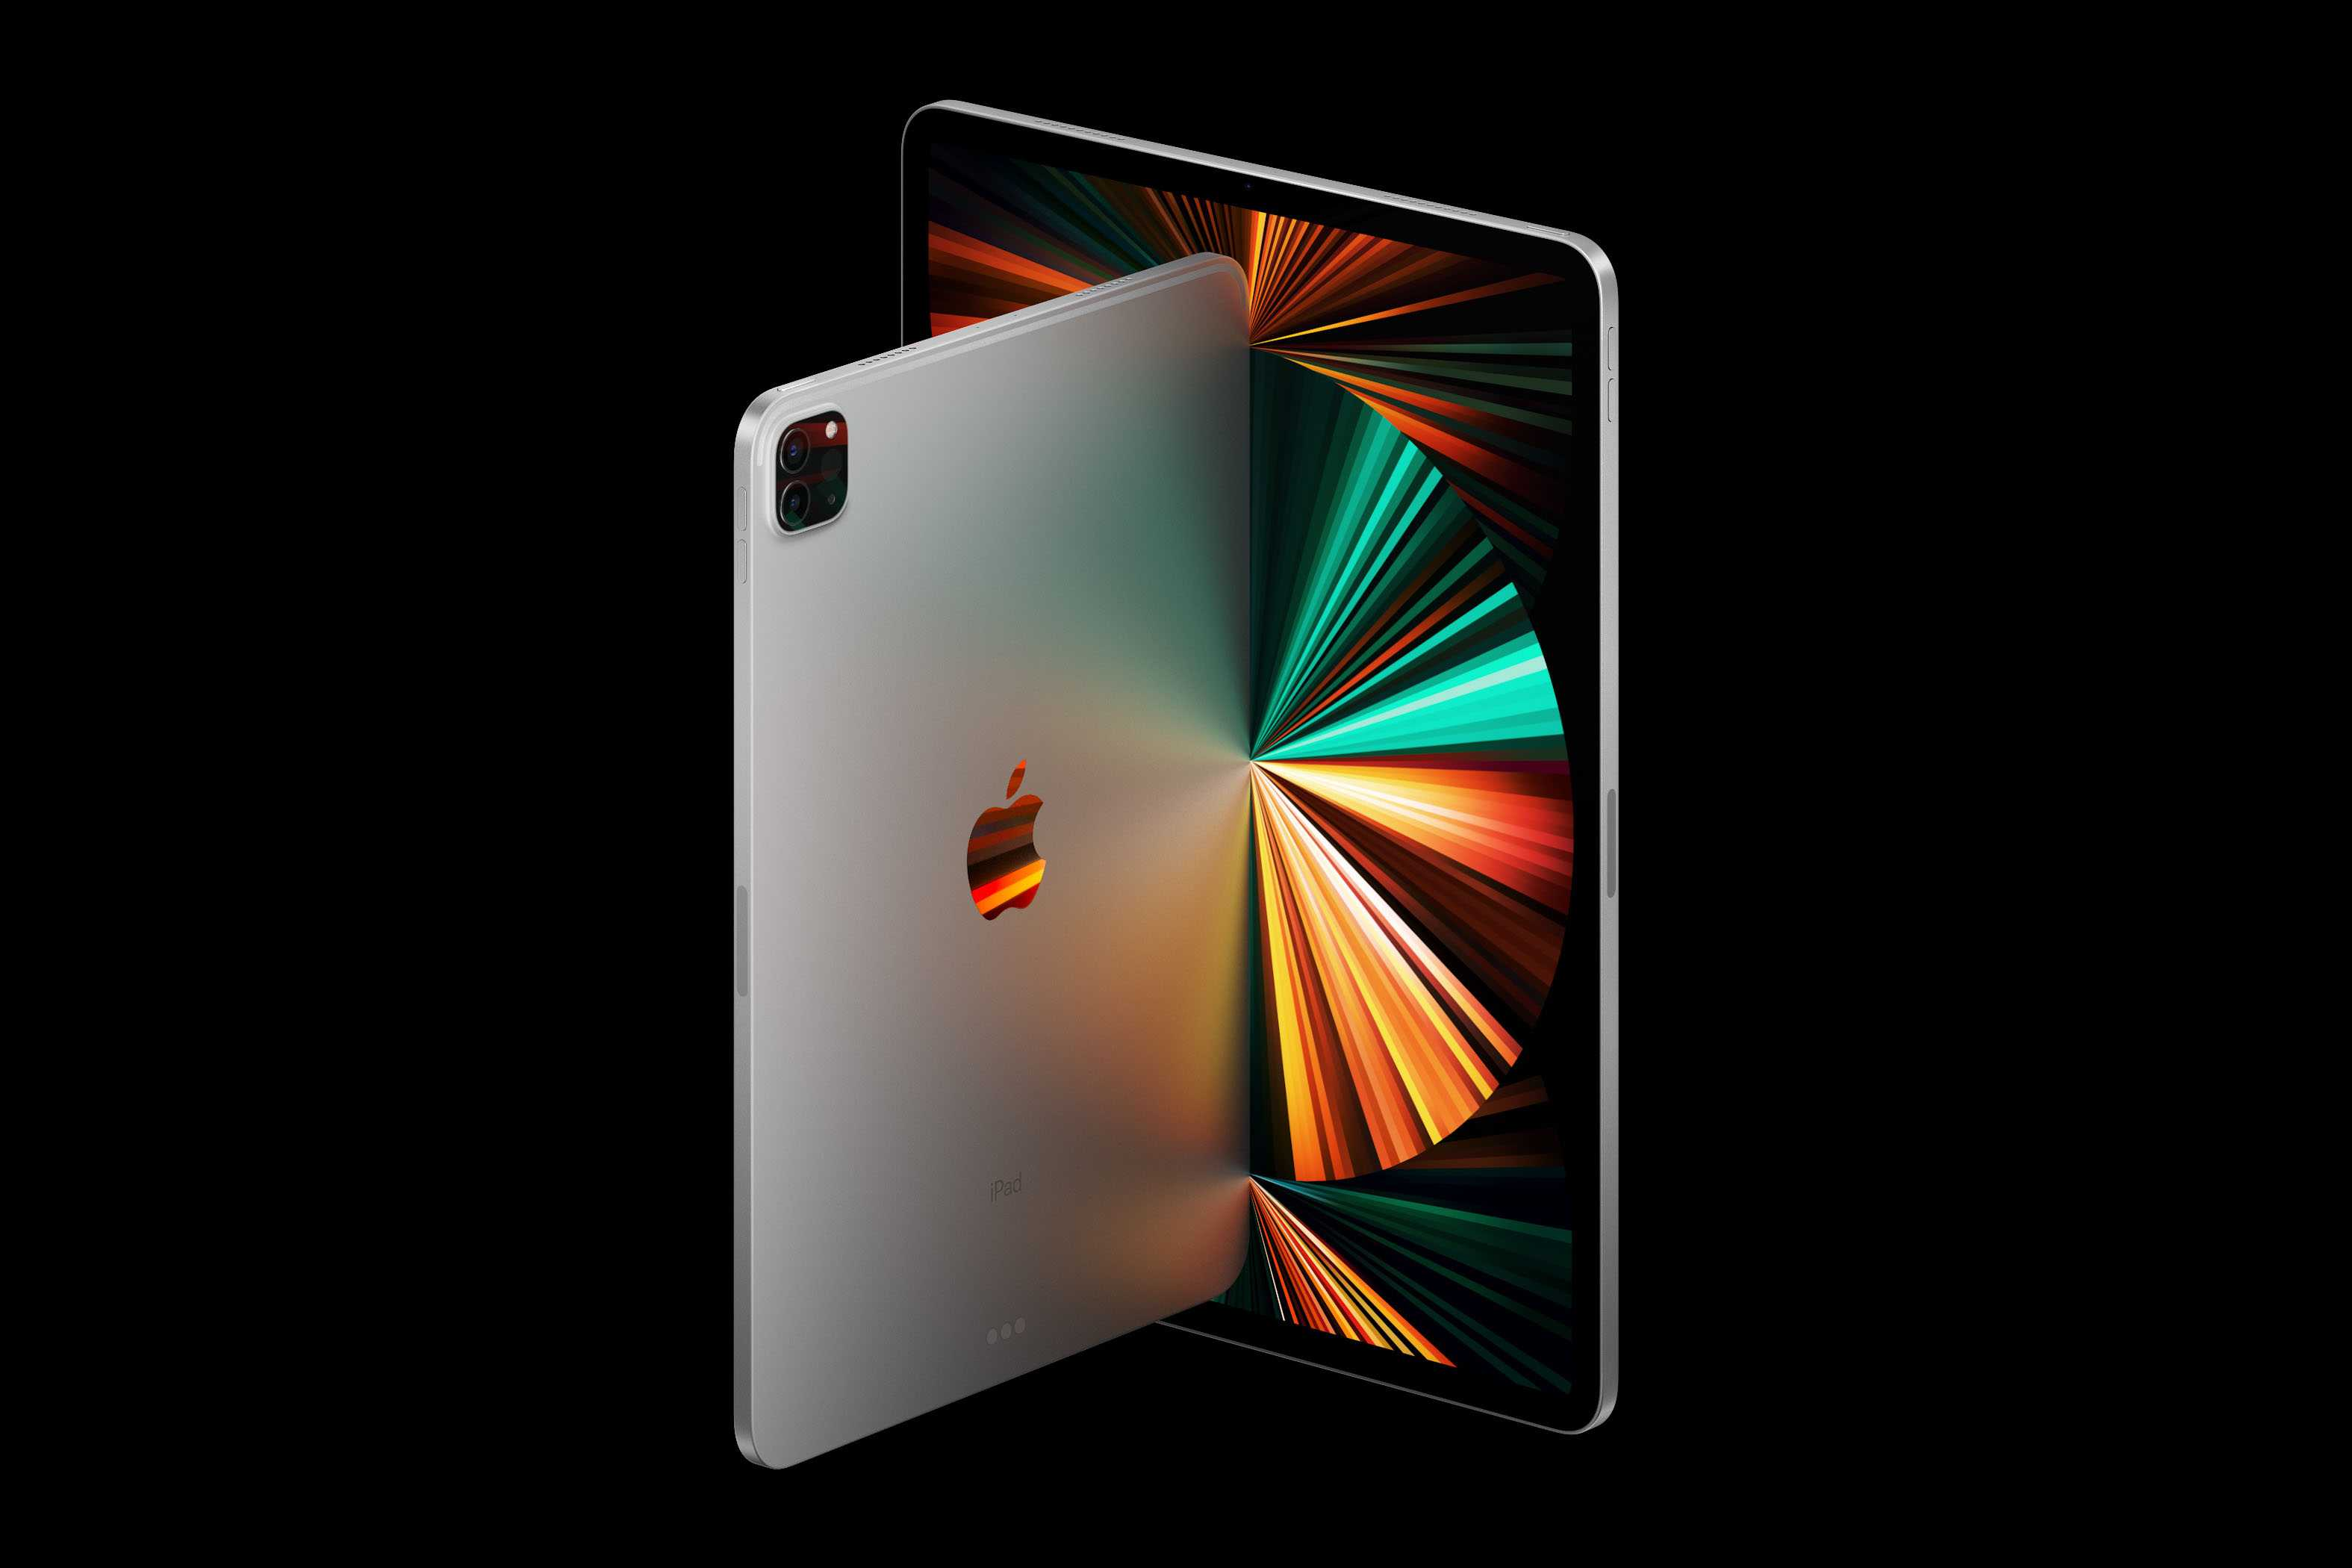 ipad-pro-2021-apple-5.jpg